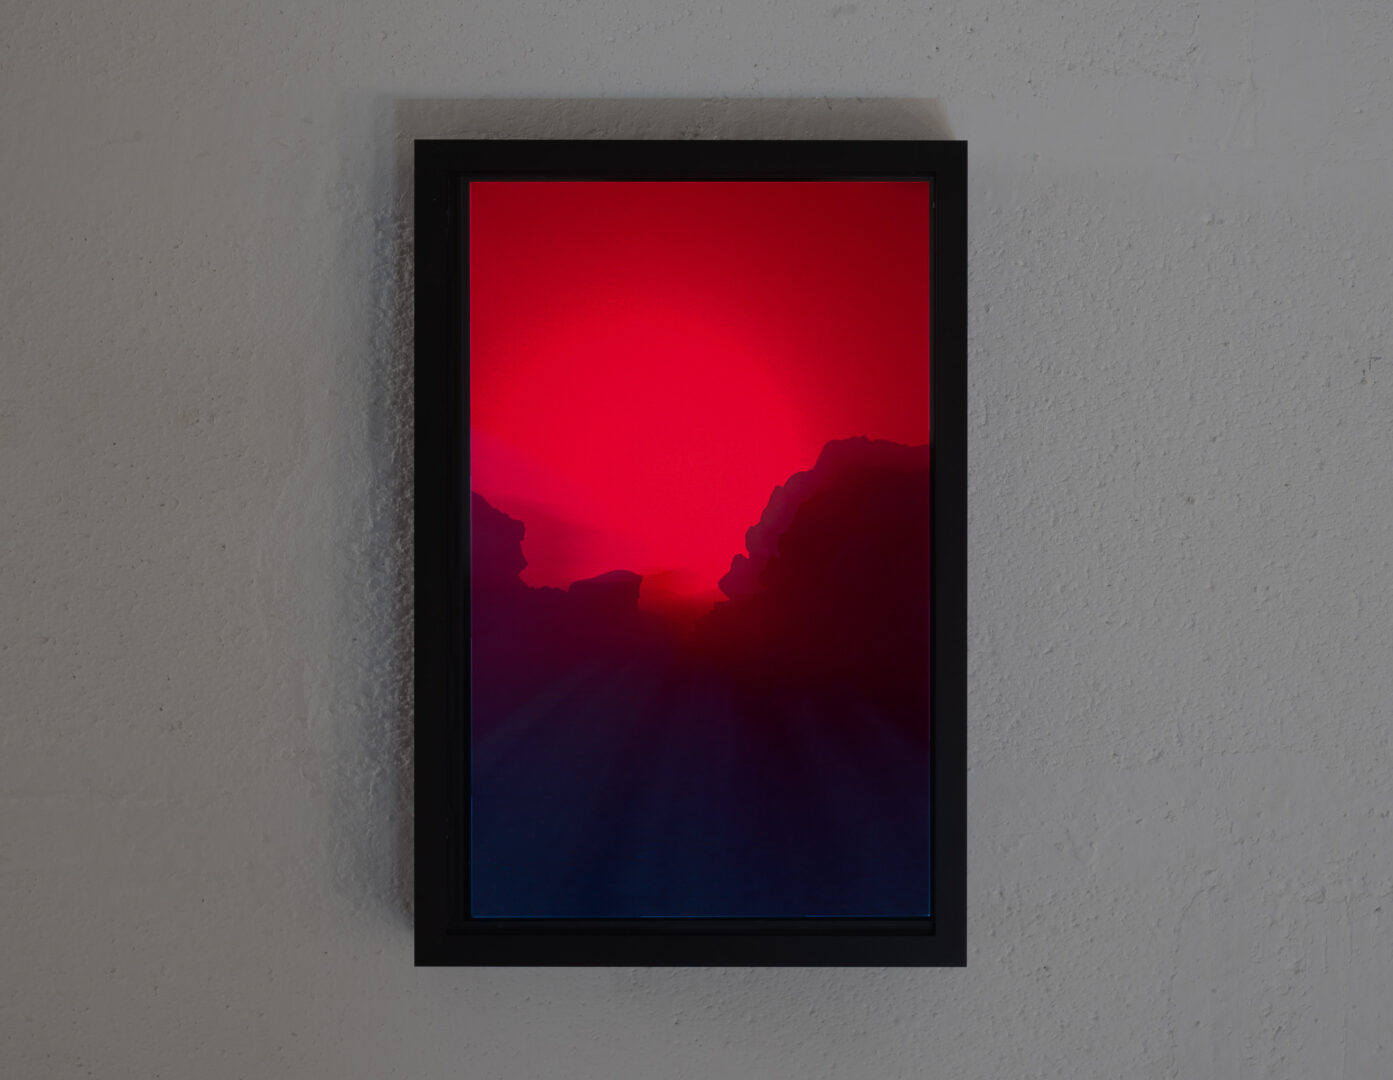 Exhibition View Rinny Gremaud and Mathieu Bernard Soloshow «Splendide; view on Au plus proche, 2019» at Galerie Heinzer Reszler, Lausanne, 2019 / Photo: Julien Gremaud / Courtesy: the artist and Heinzer Reszler